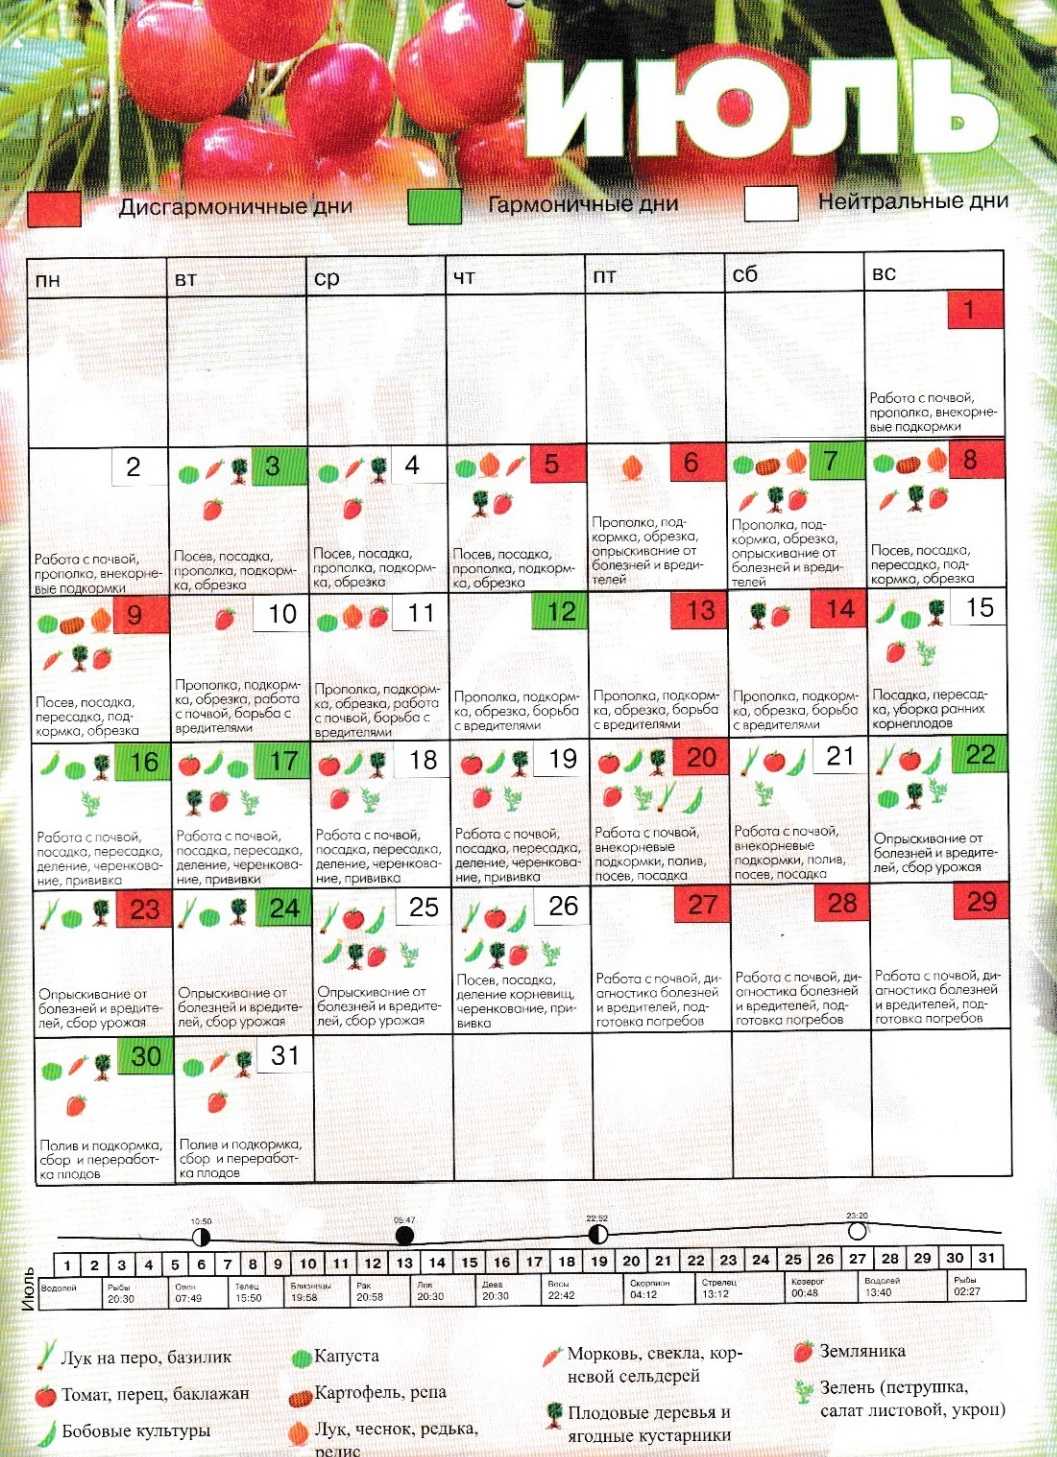 лунный календарь огородника - июль 2018